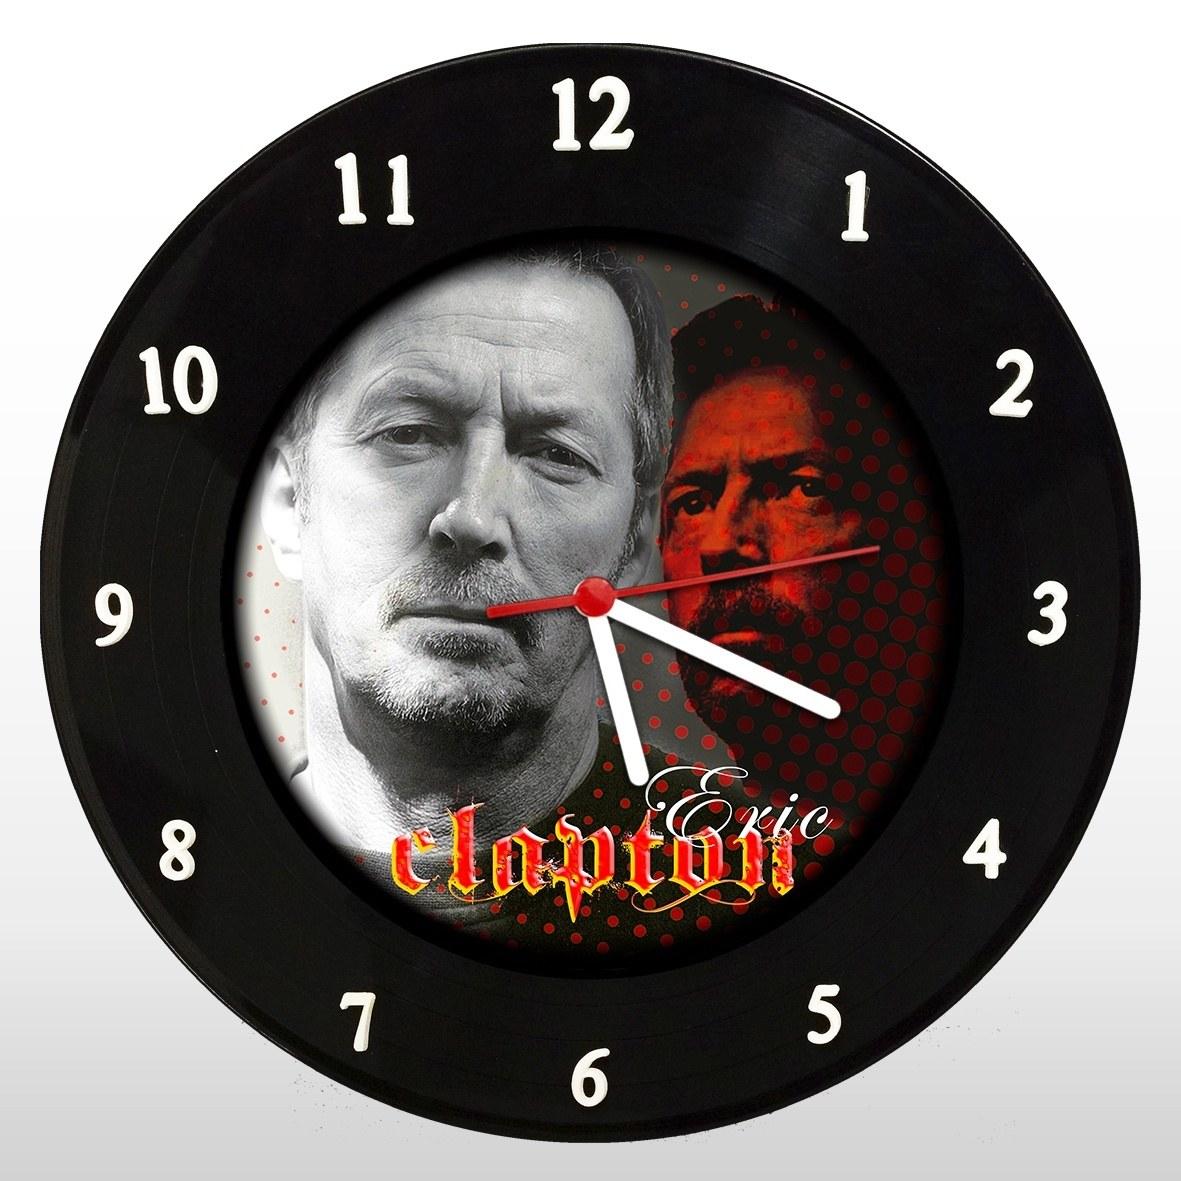 Eric Clapton - Relógio de Parede em Disco de Vinil - Mr. Rock